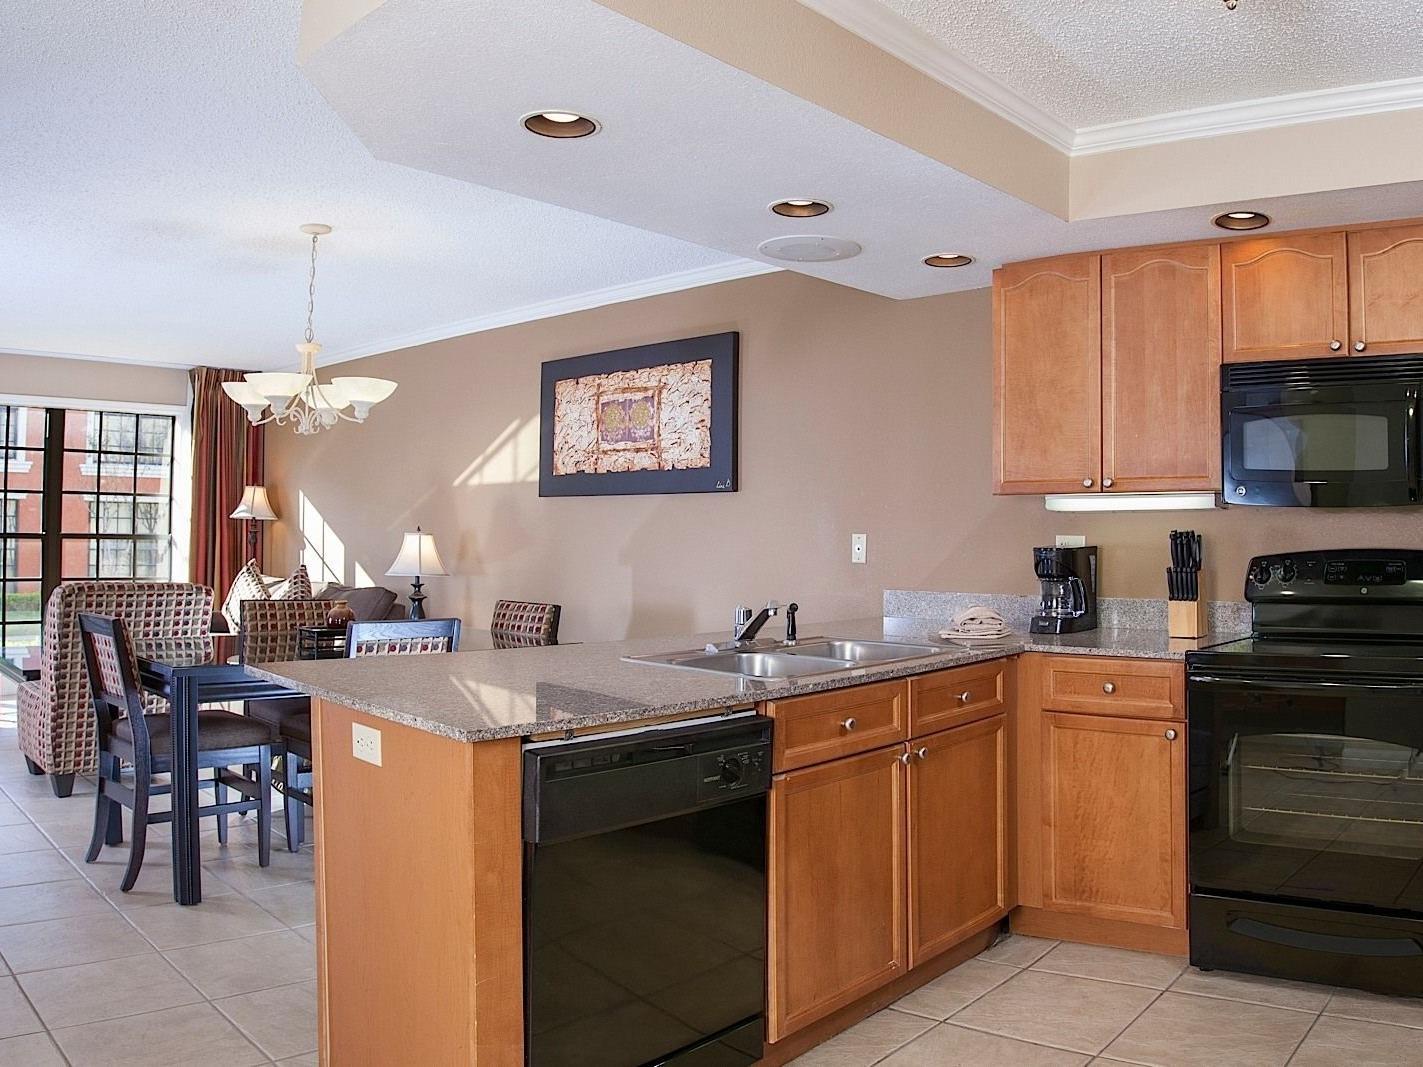 Kitchen Area -  Legacy Vacation Resorts